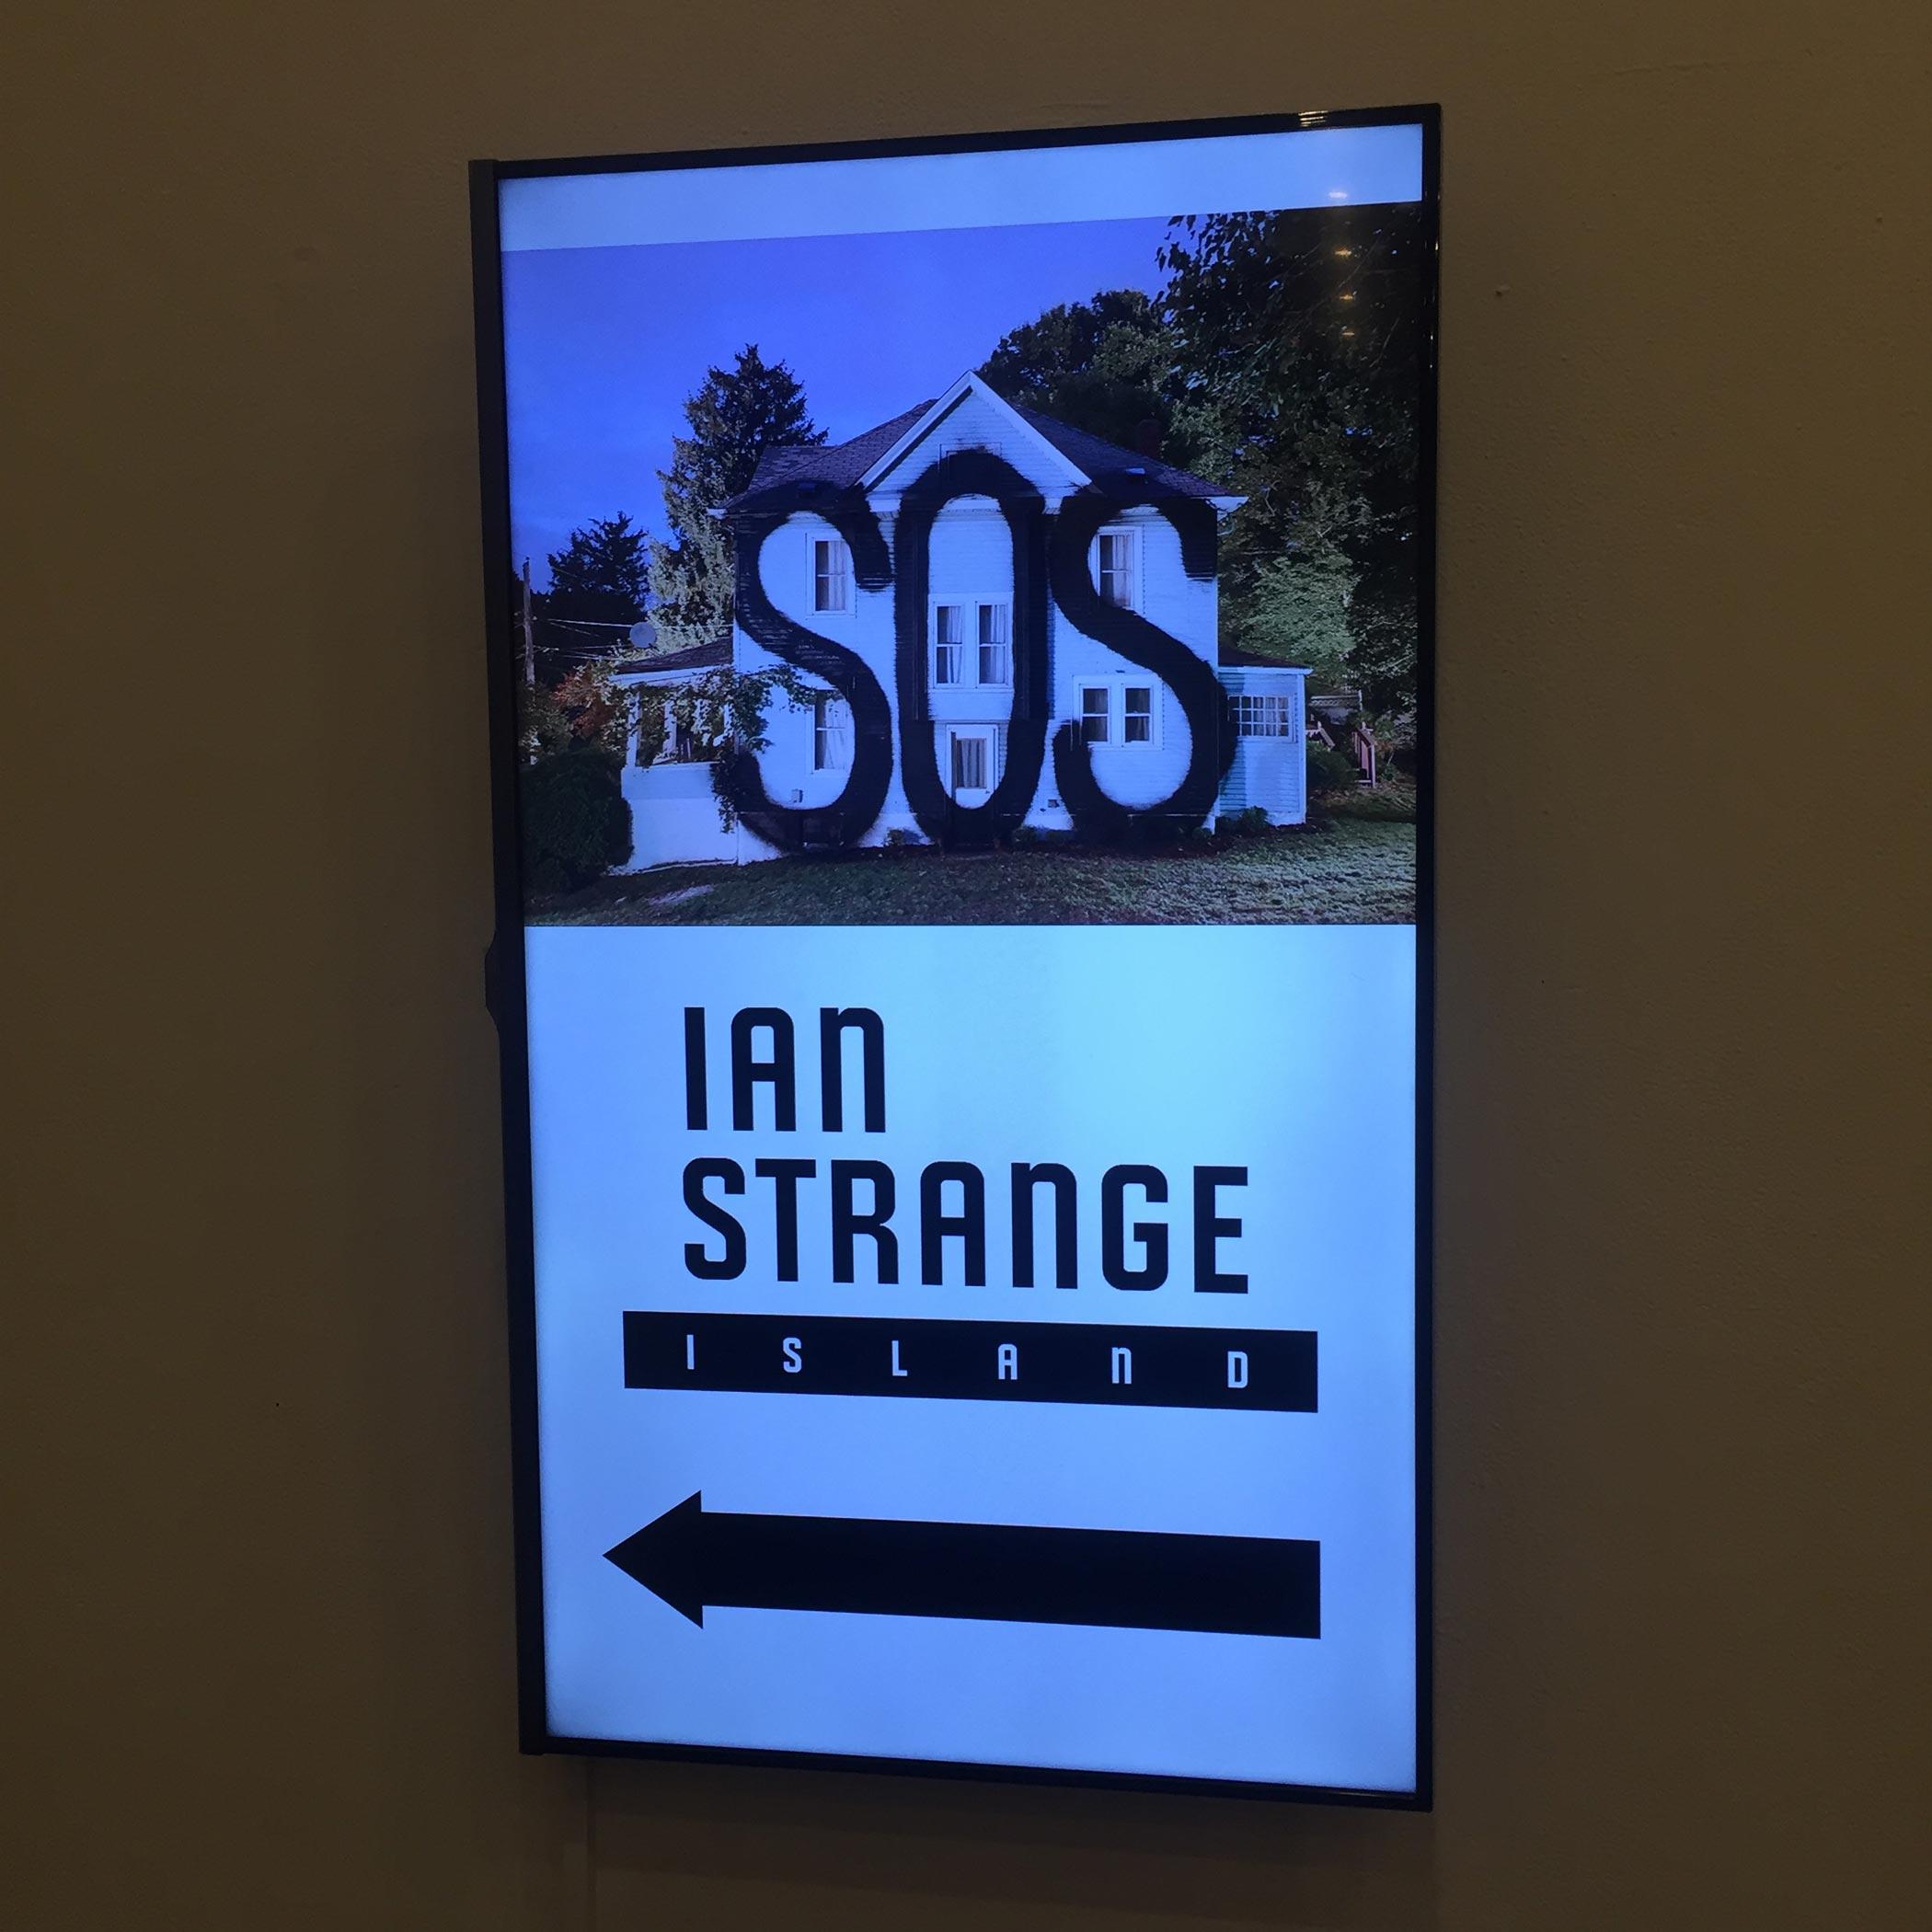 Ian-strange-super-minimal-1